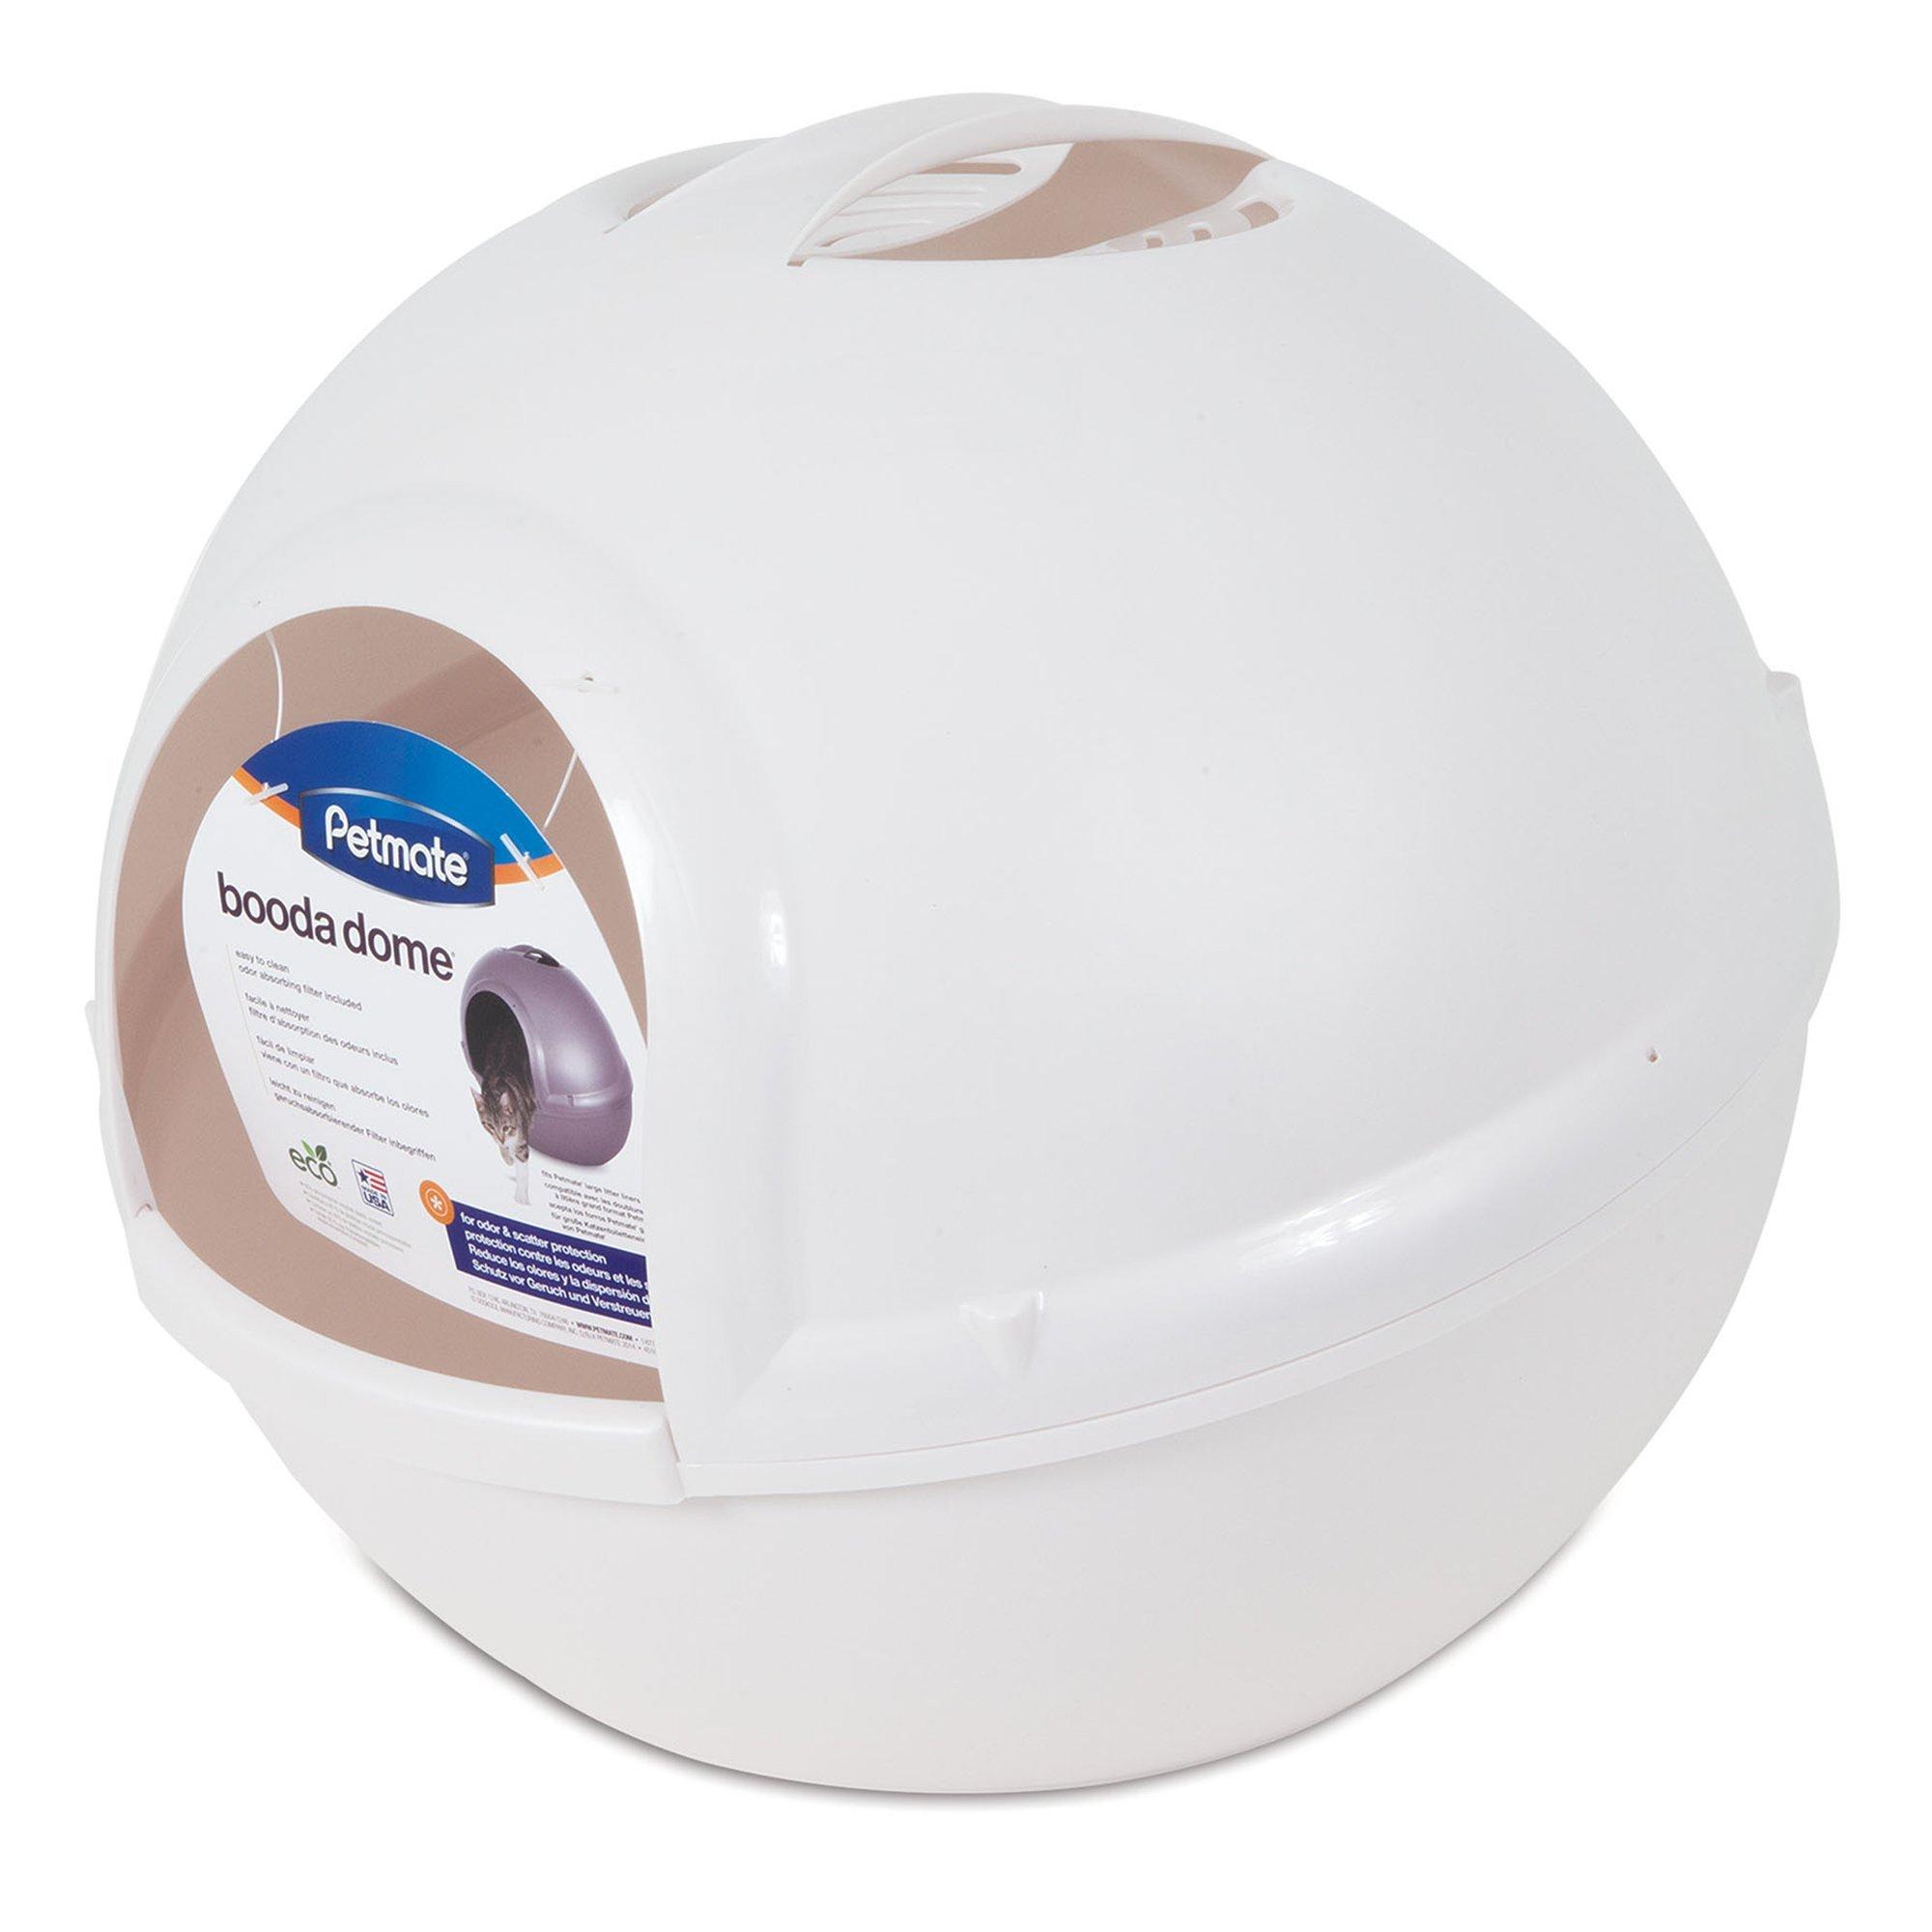 Petmate Booda Dome Pearl Litter Box, White by Petmate